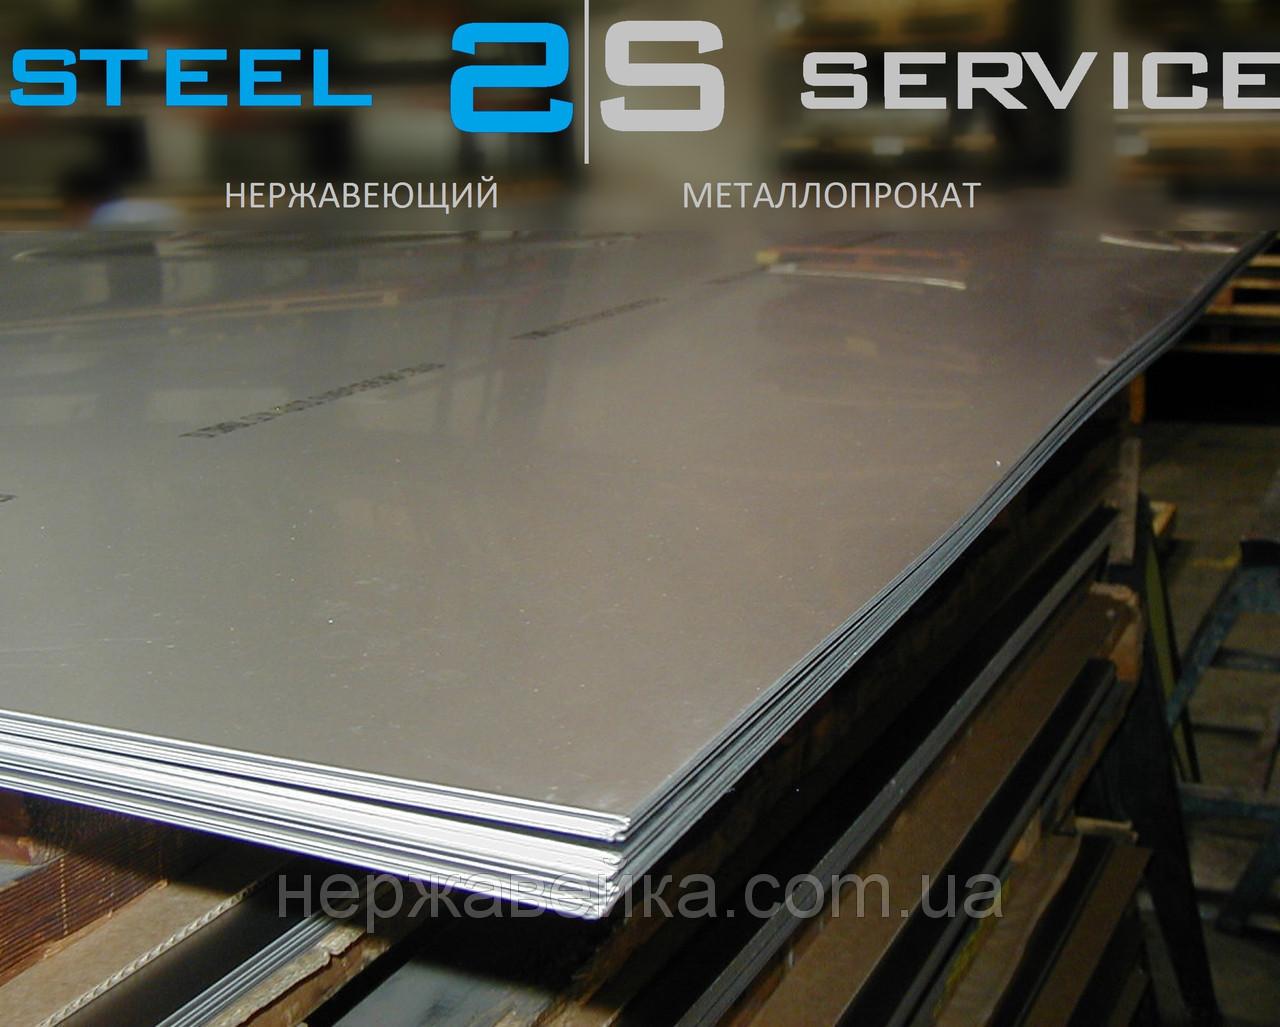 Нержавейка лист 3х1250х2500мм AISI 430(12Х17) BA - зеркало, технический